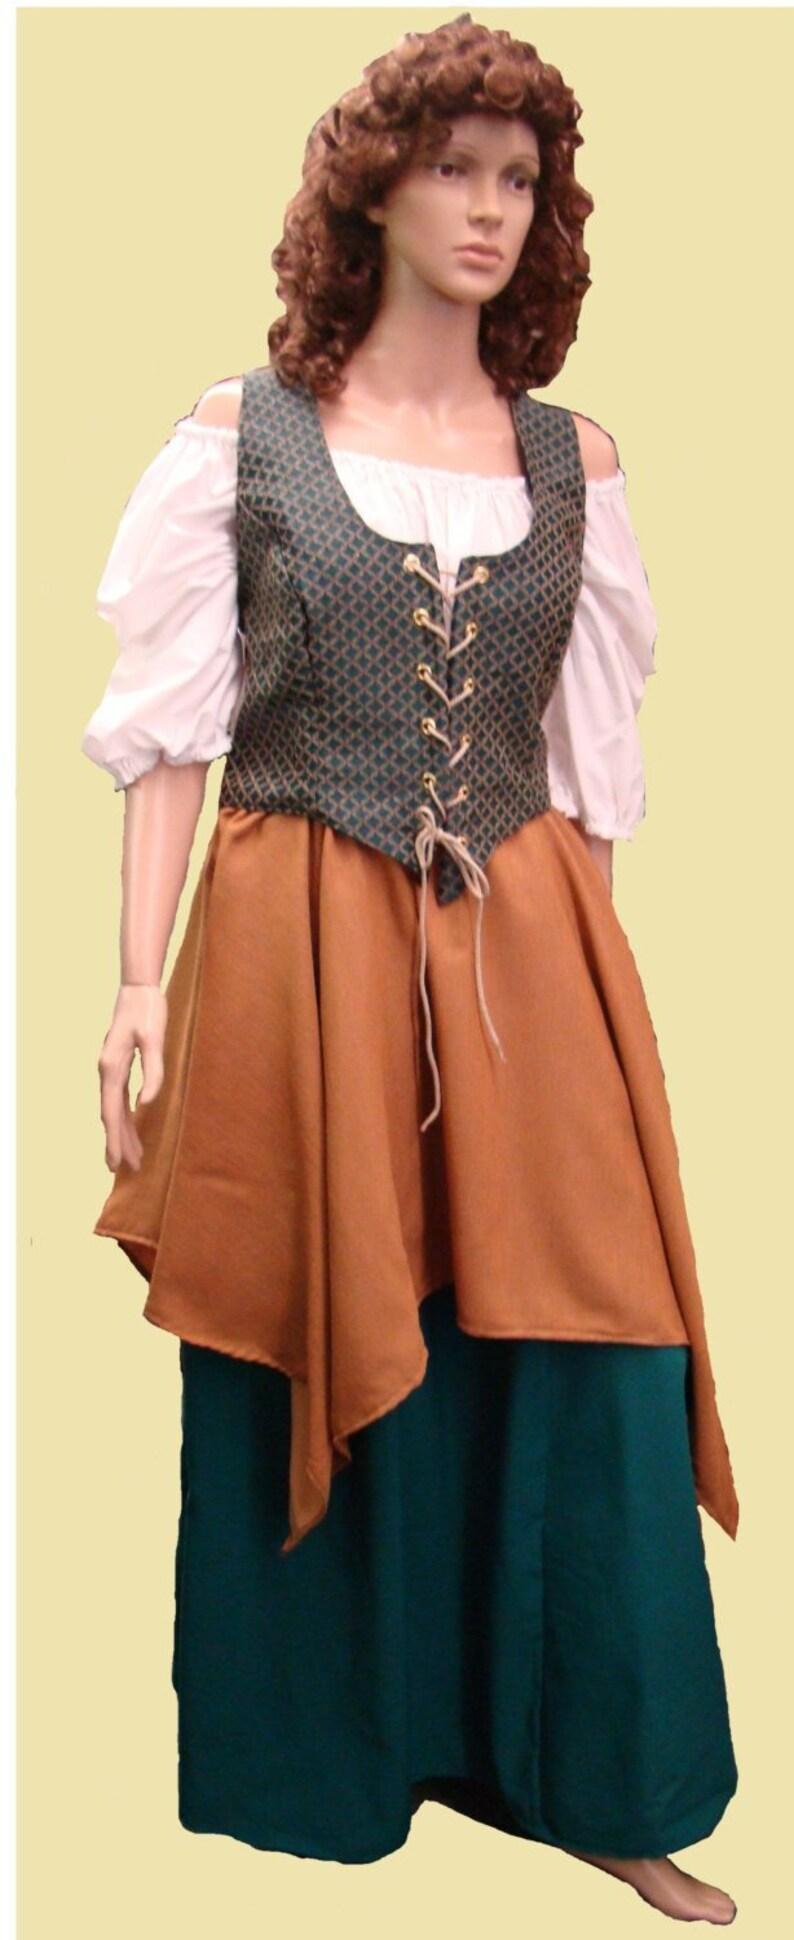 0e23d6a82d4 Price Reduced Costume Plus Size Adult Woman Renaissance Gypsy